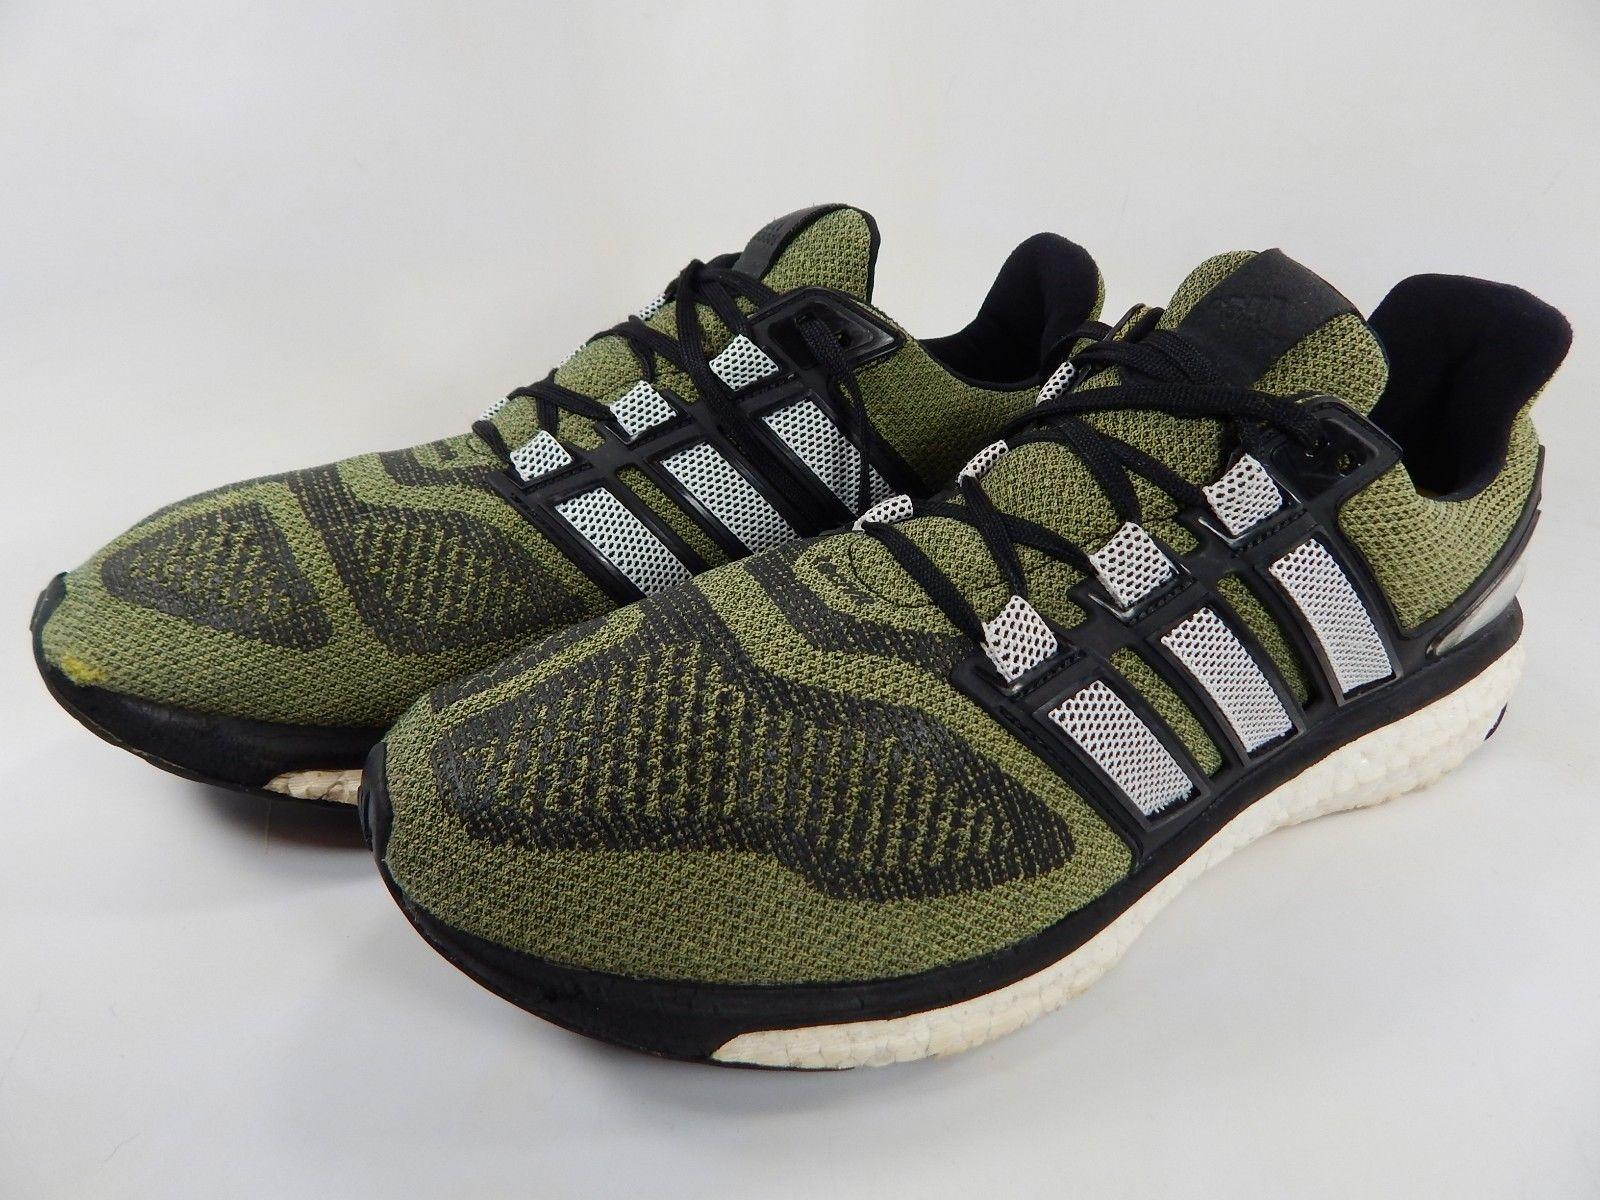 Adidas Energy Boost 3 M Size US 11.5 M (D) EU 46 Men's Running Shoes Green